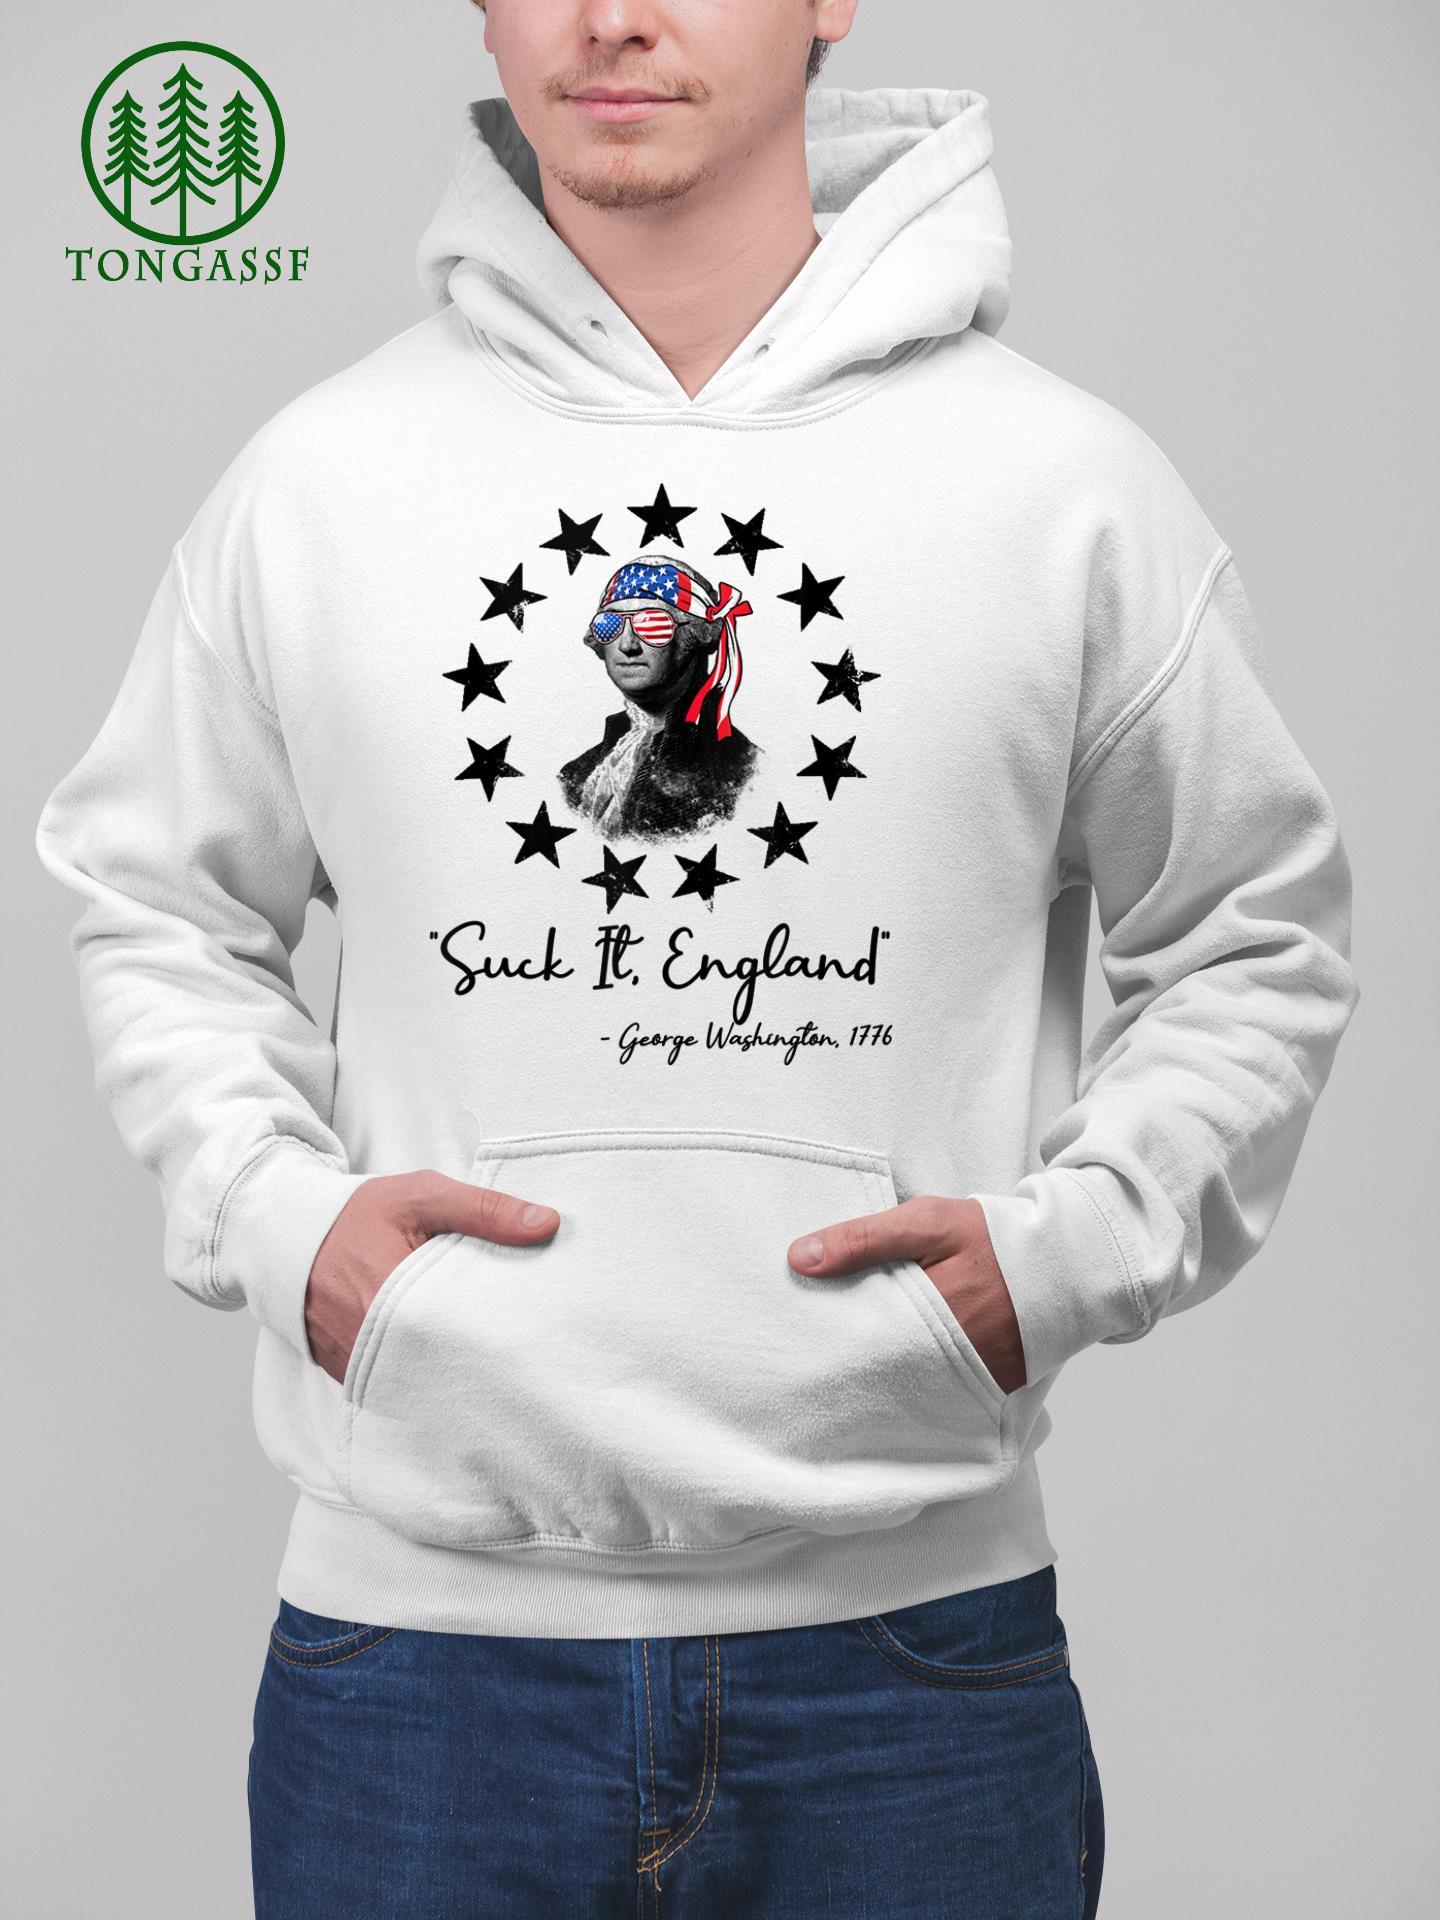 Suck It England George Washington 1776 t shirt